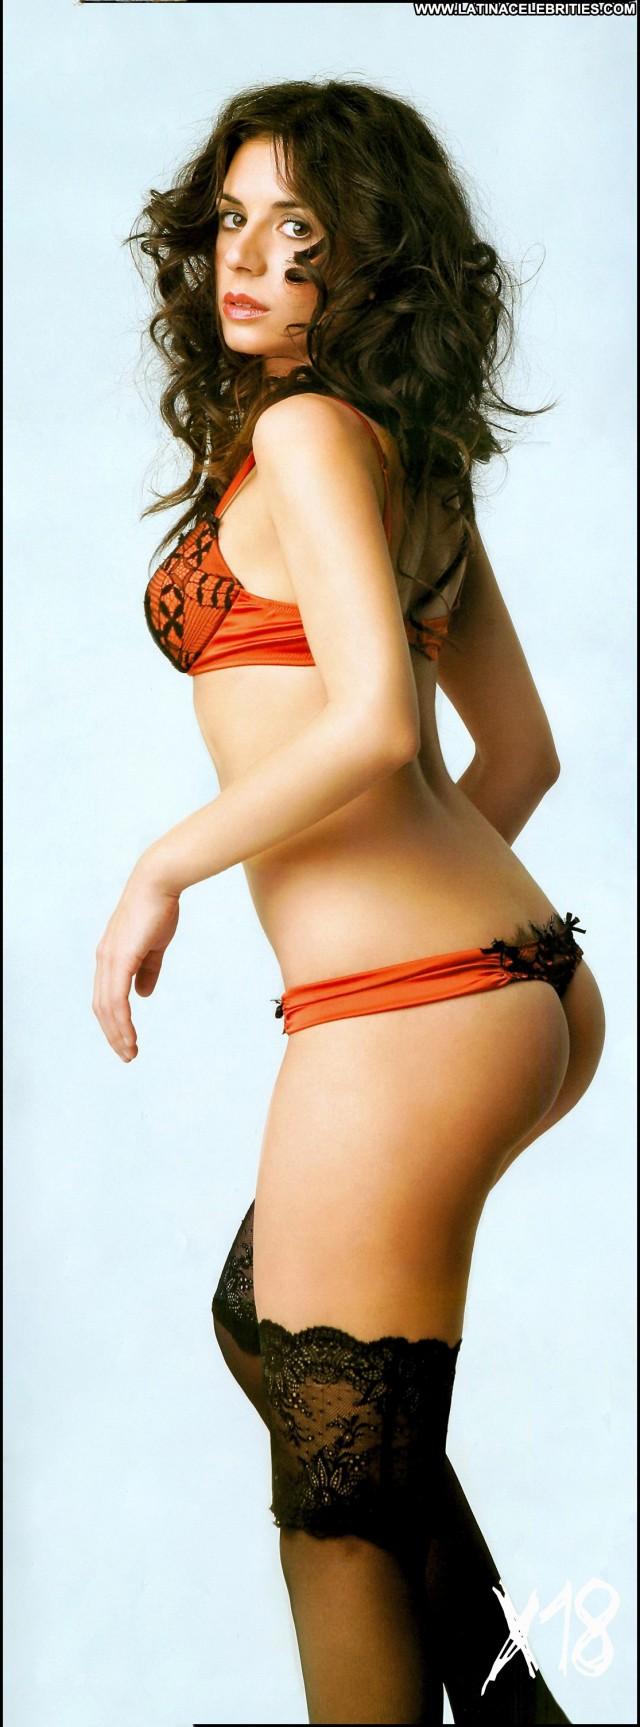 Miren Ibarguren Miscellaneous Small Tits Celebrity Brunette Hot